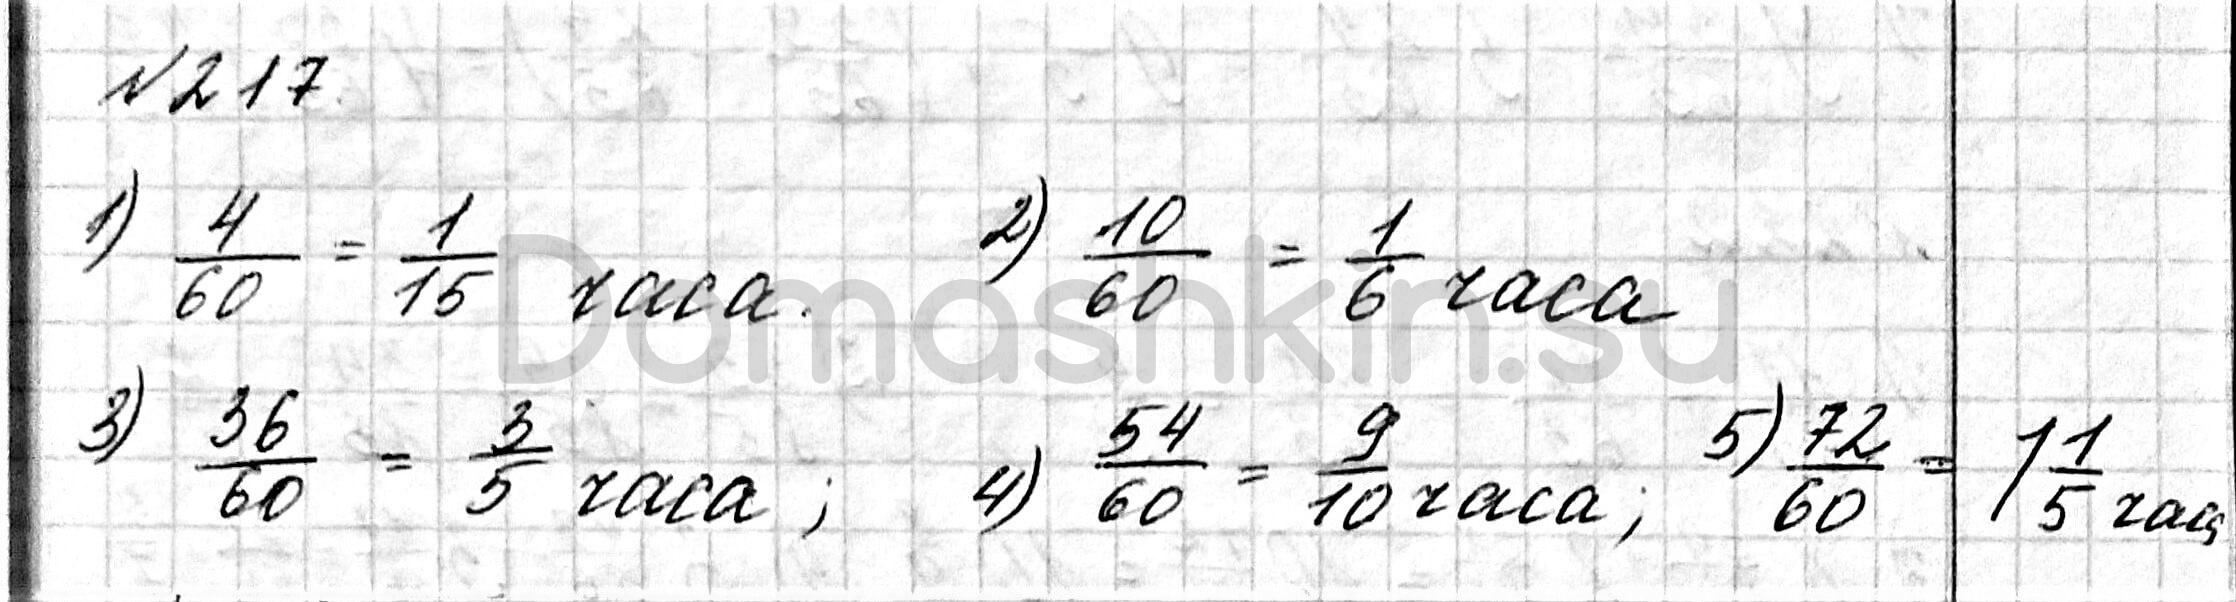 Математика 6 класс учебник Мерзляк номер 217 решение